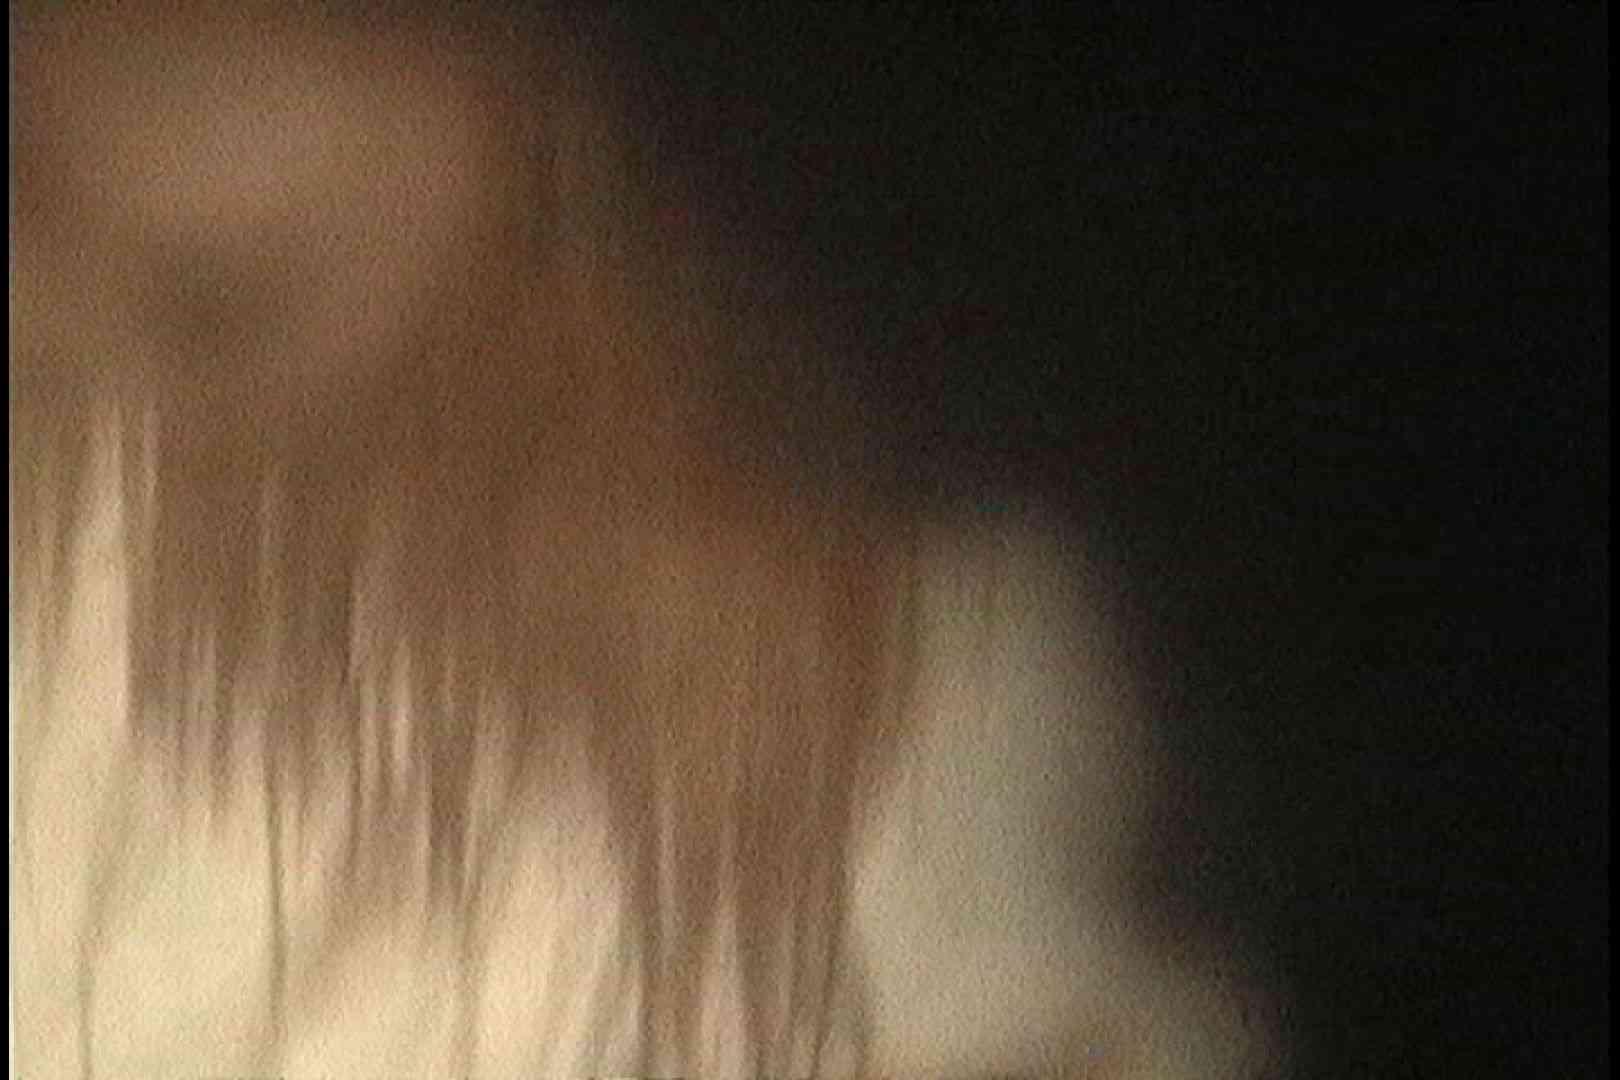 No.53 金髪ギャルの乳首に向かってズームイン 接写 濡れ場動画紹介 109枚 22